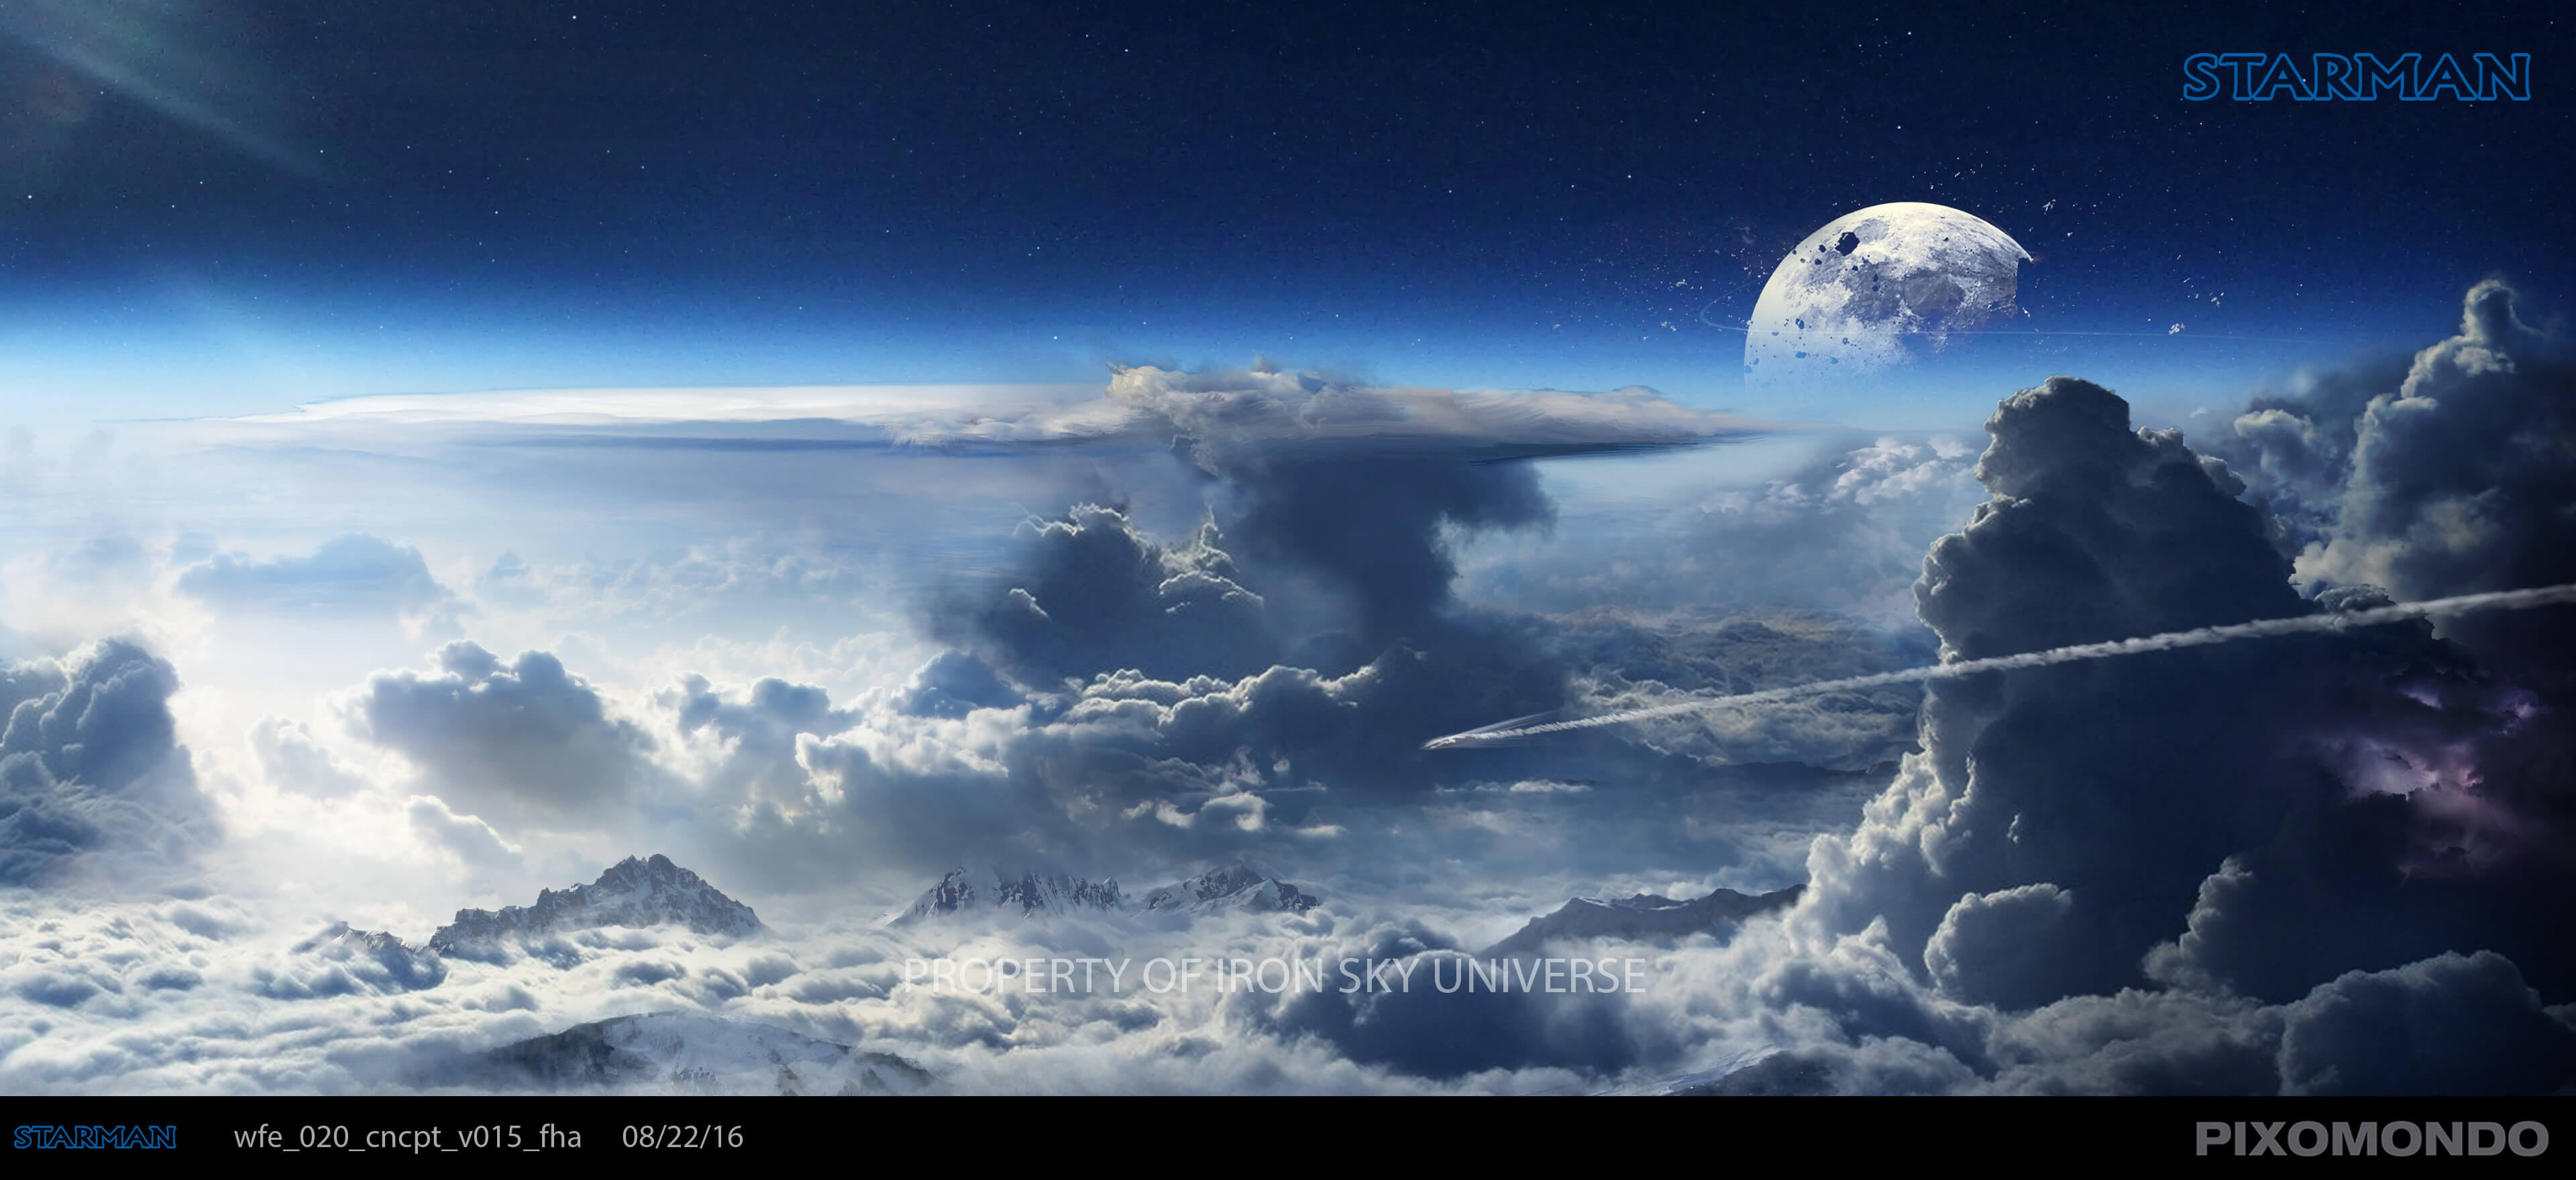 iron-sky-2-concept-art-walkyr-flying-earth-v015-pixomondo-felix-botho-haas.jpg